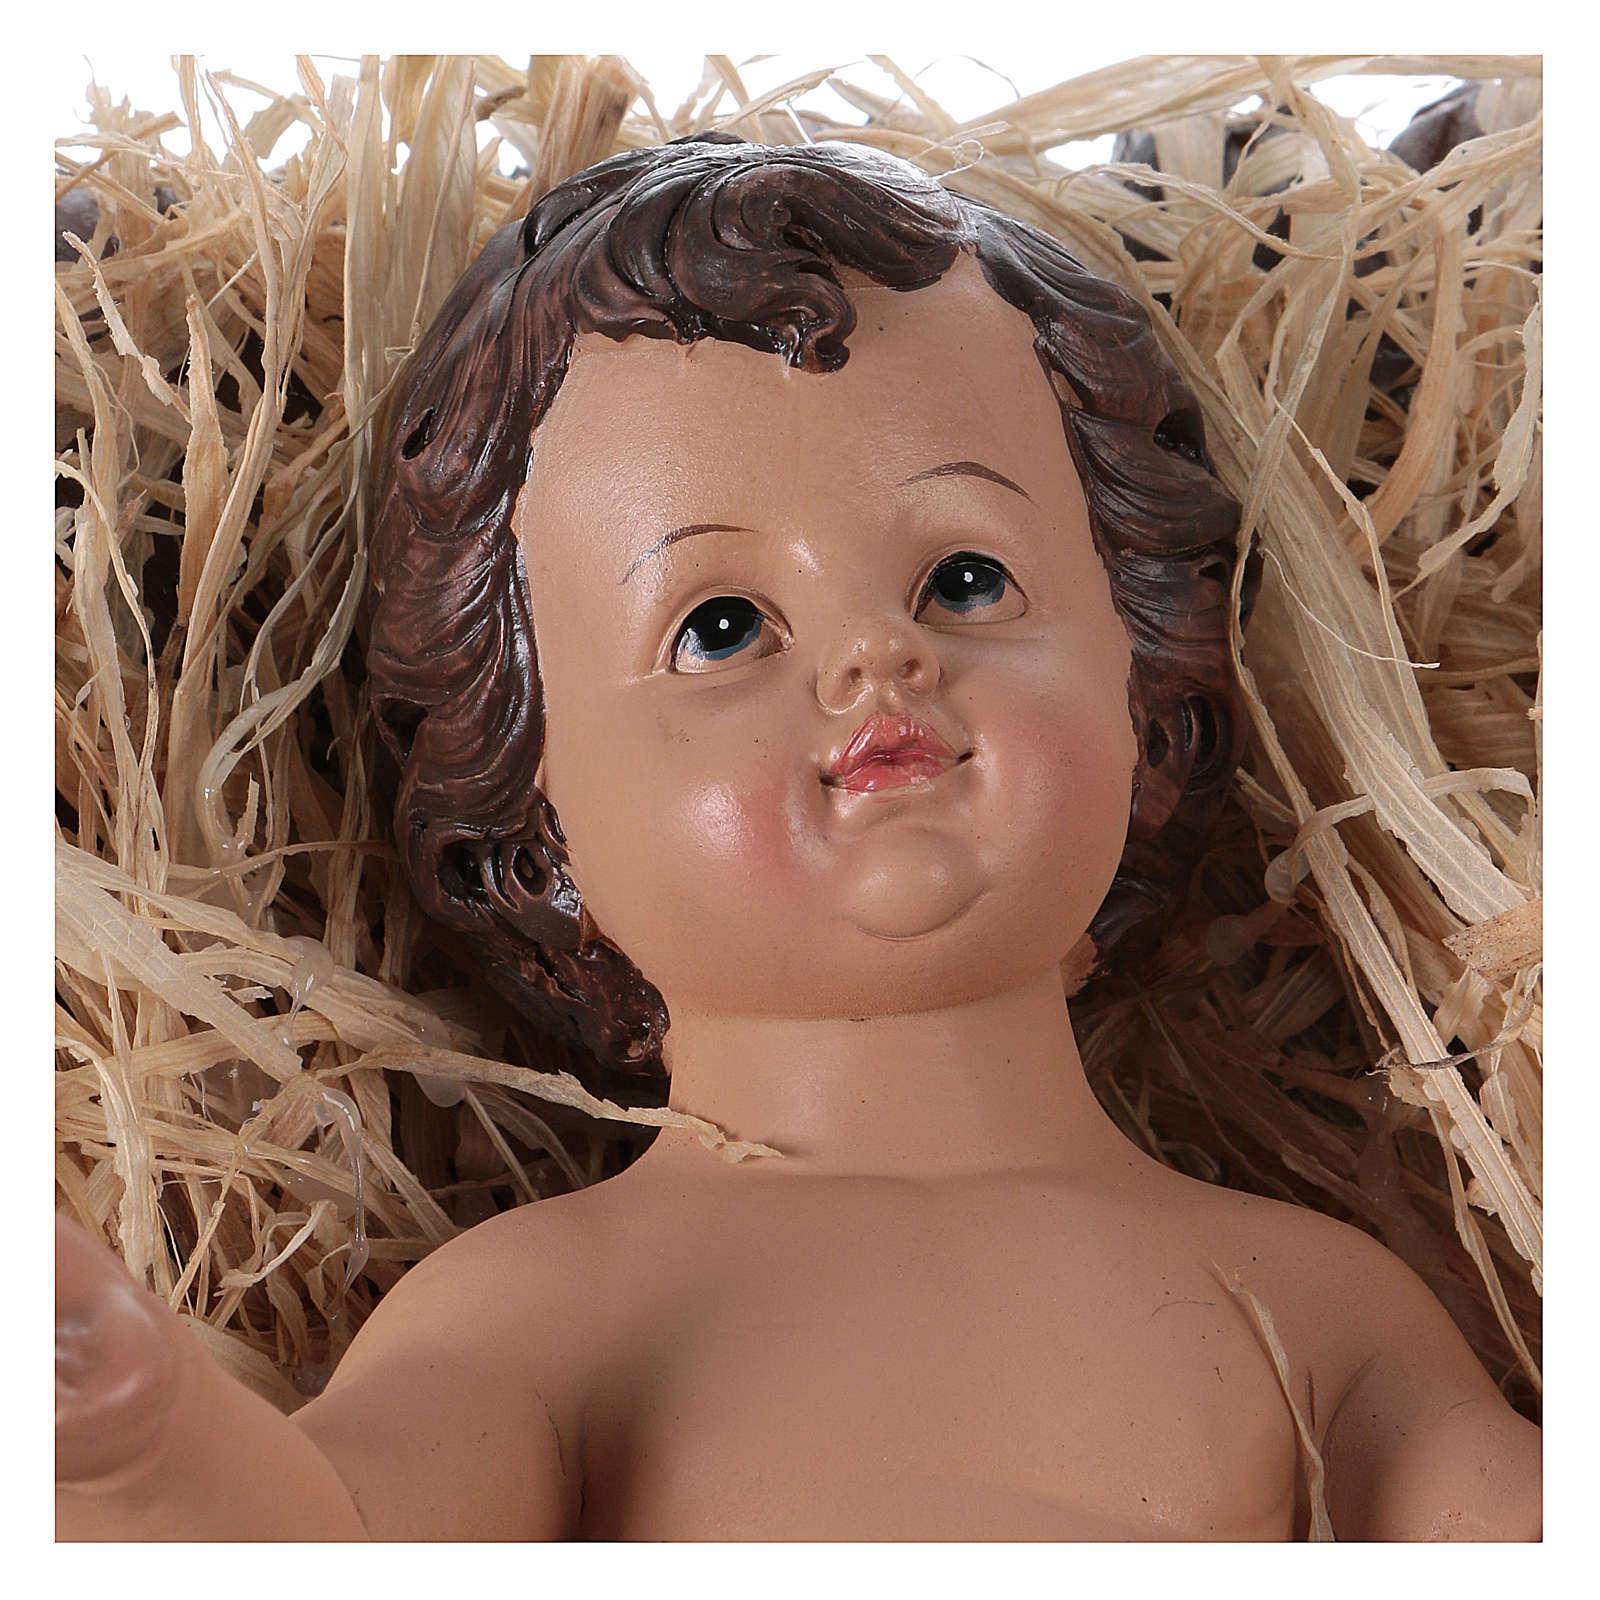 Niño Jesús en la cuna para belén 60 cm de altura media resina 3